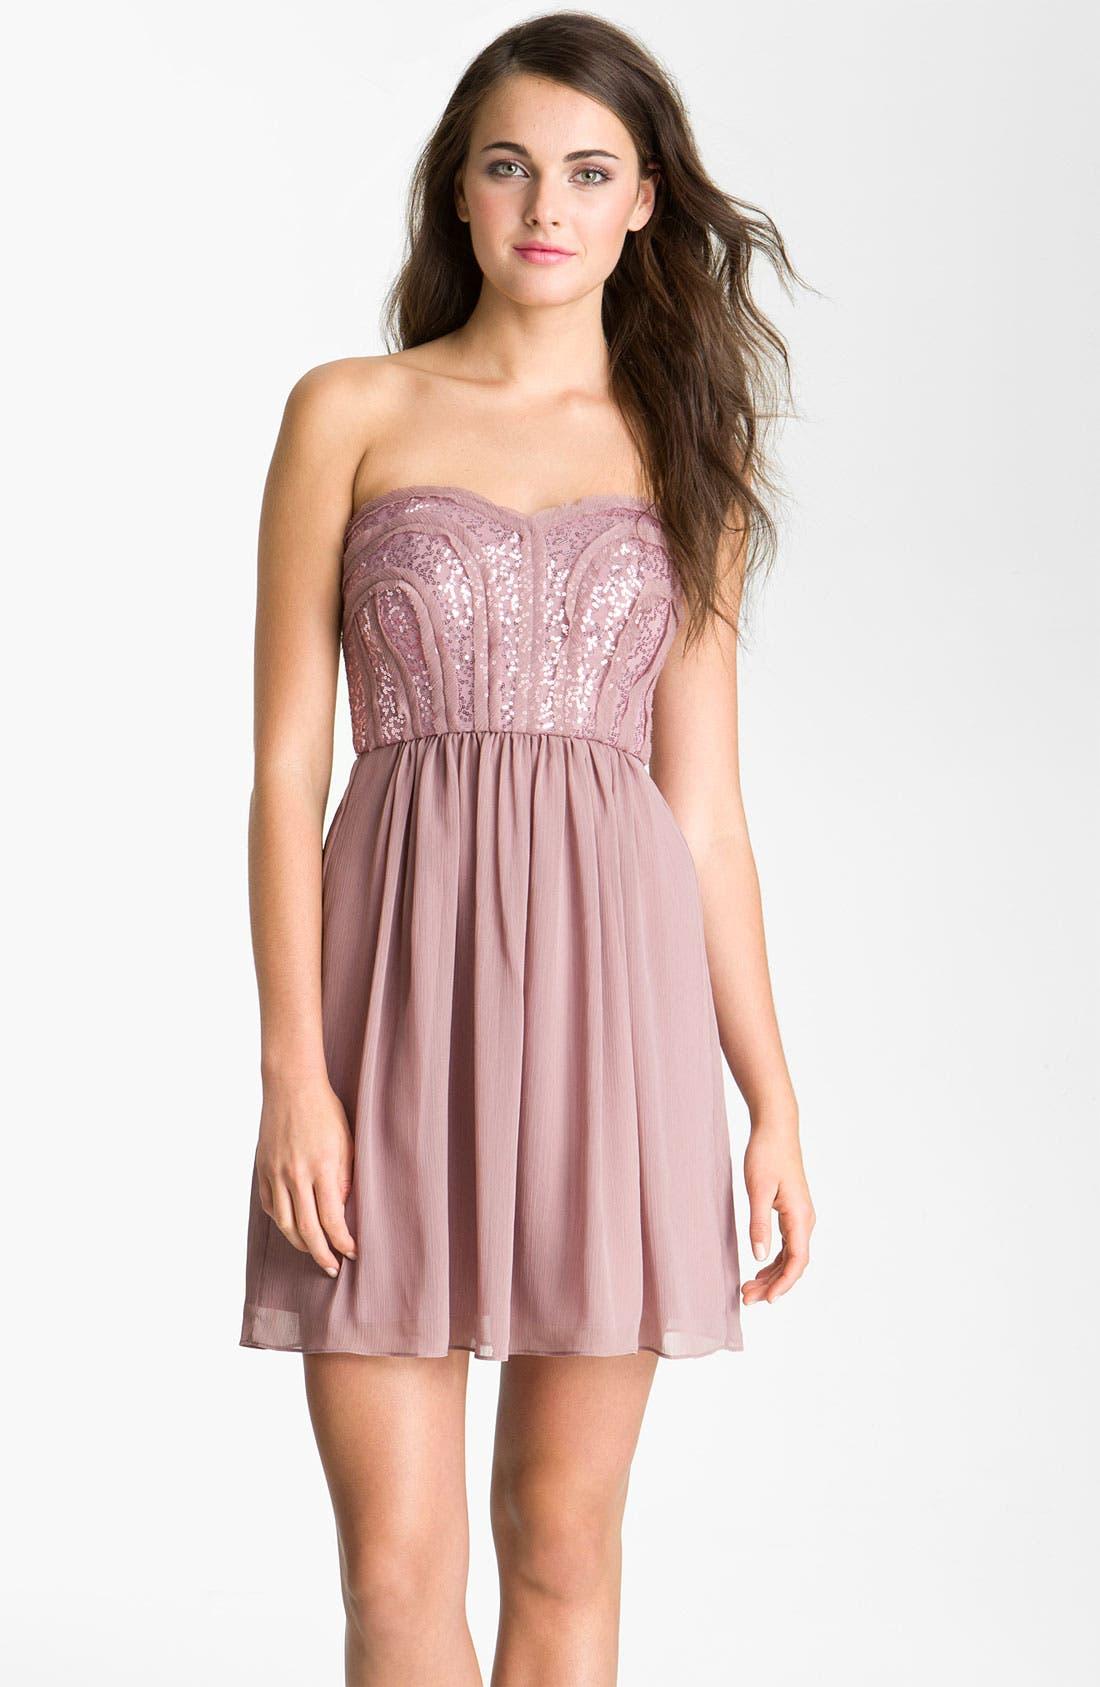 Main Image - Max & Cleo 'Monica' Sequin Bodice Sweetheart Chiffon Dress